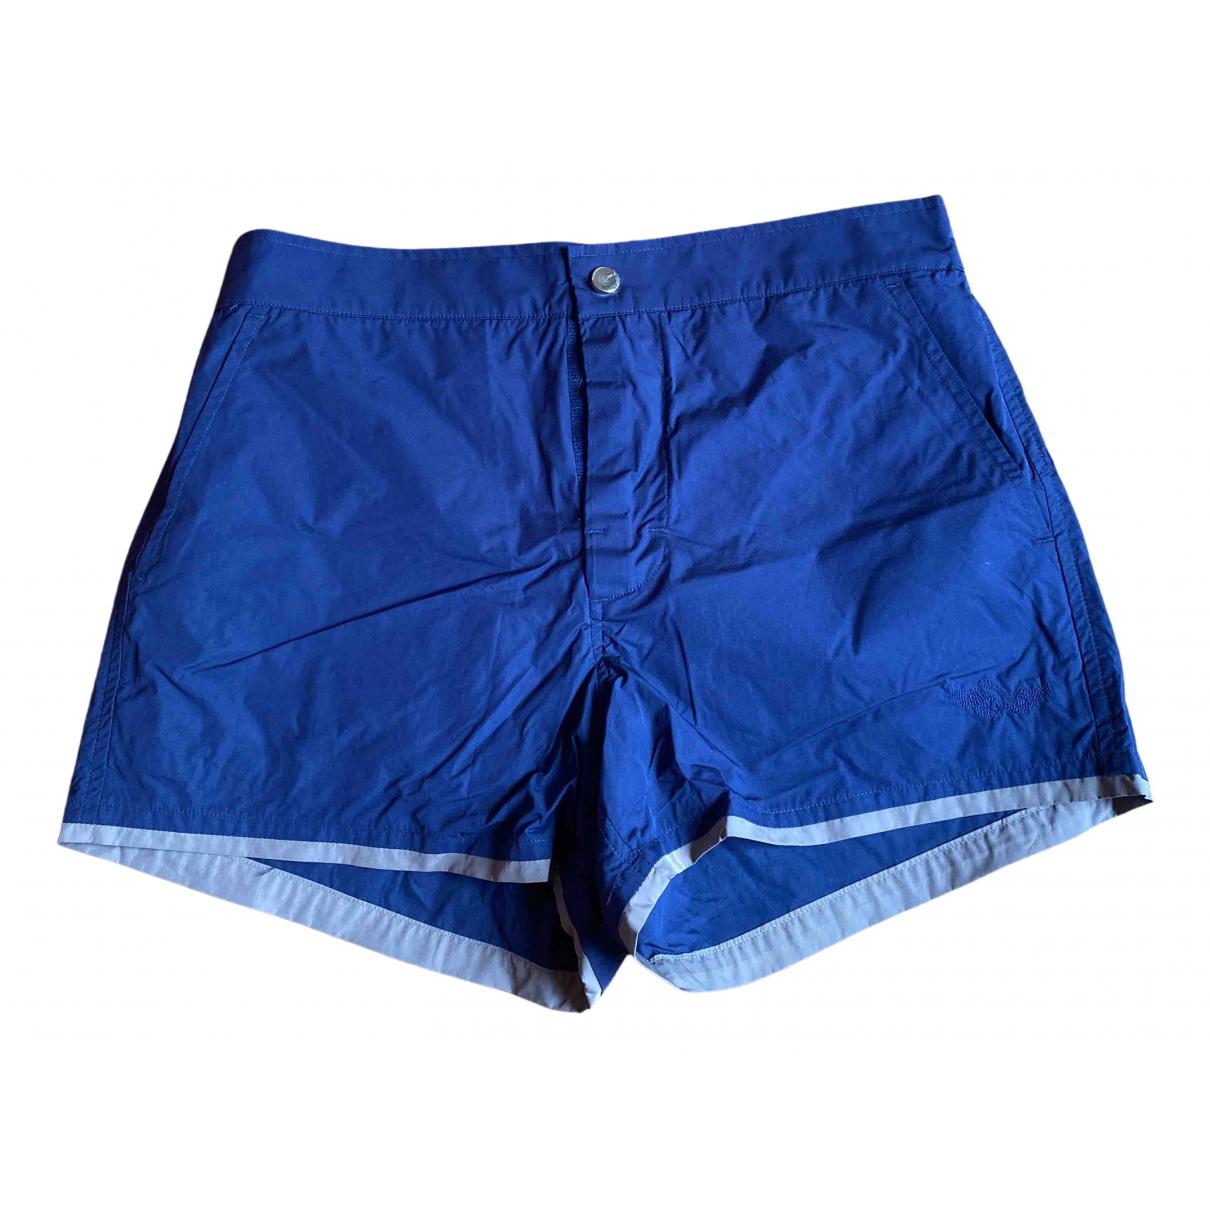 La Perla N Navy Swimwear for Men S International